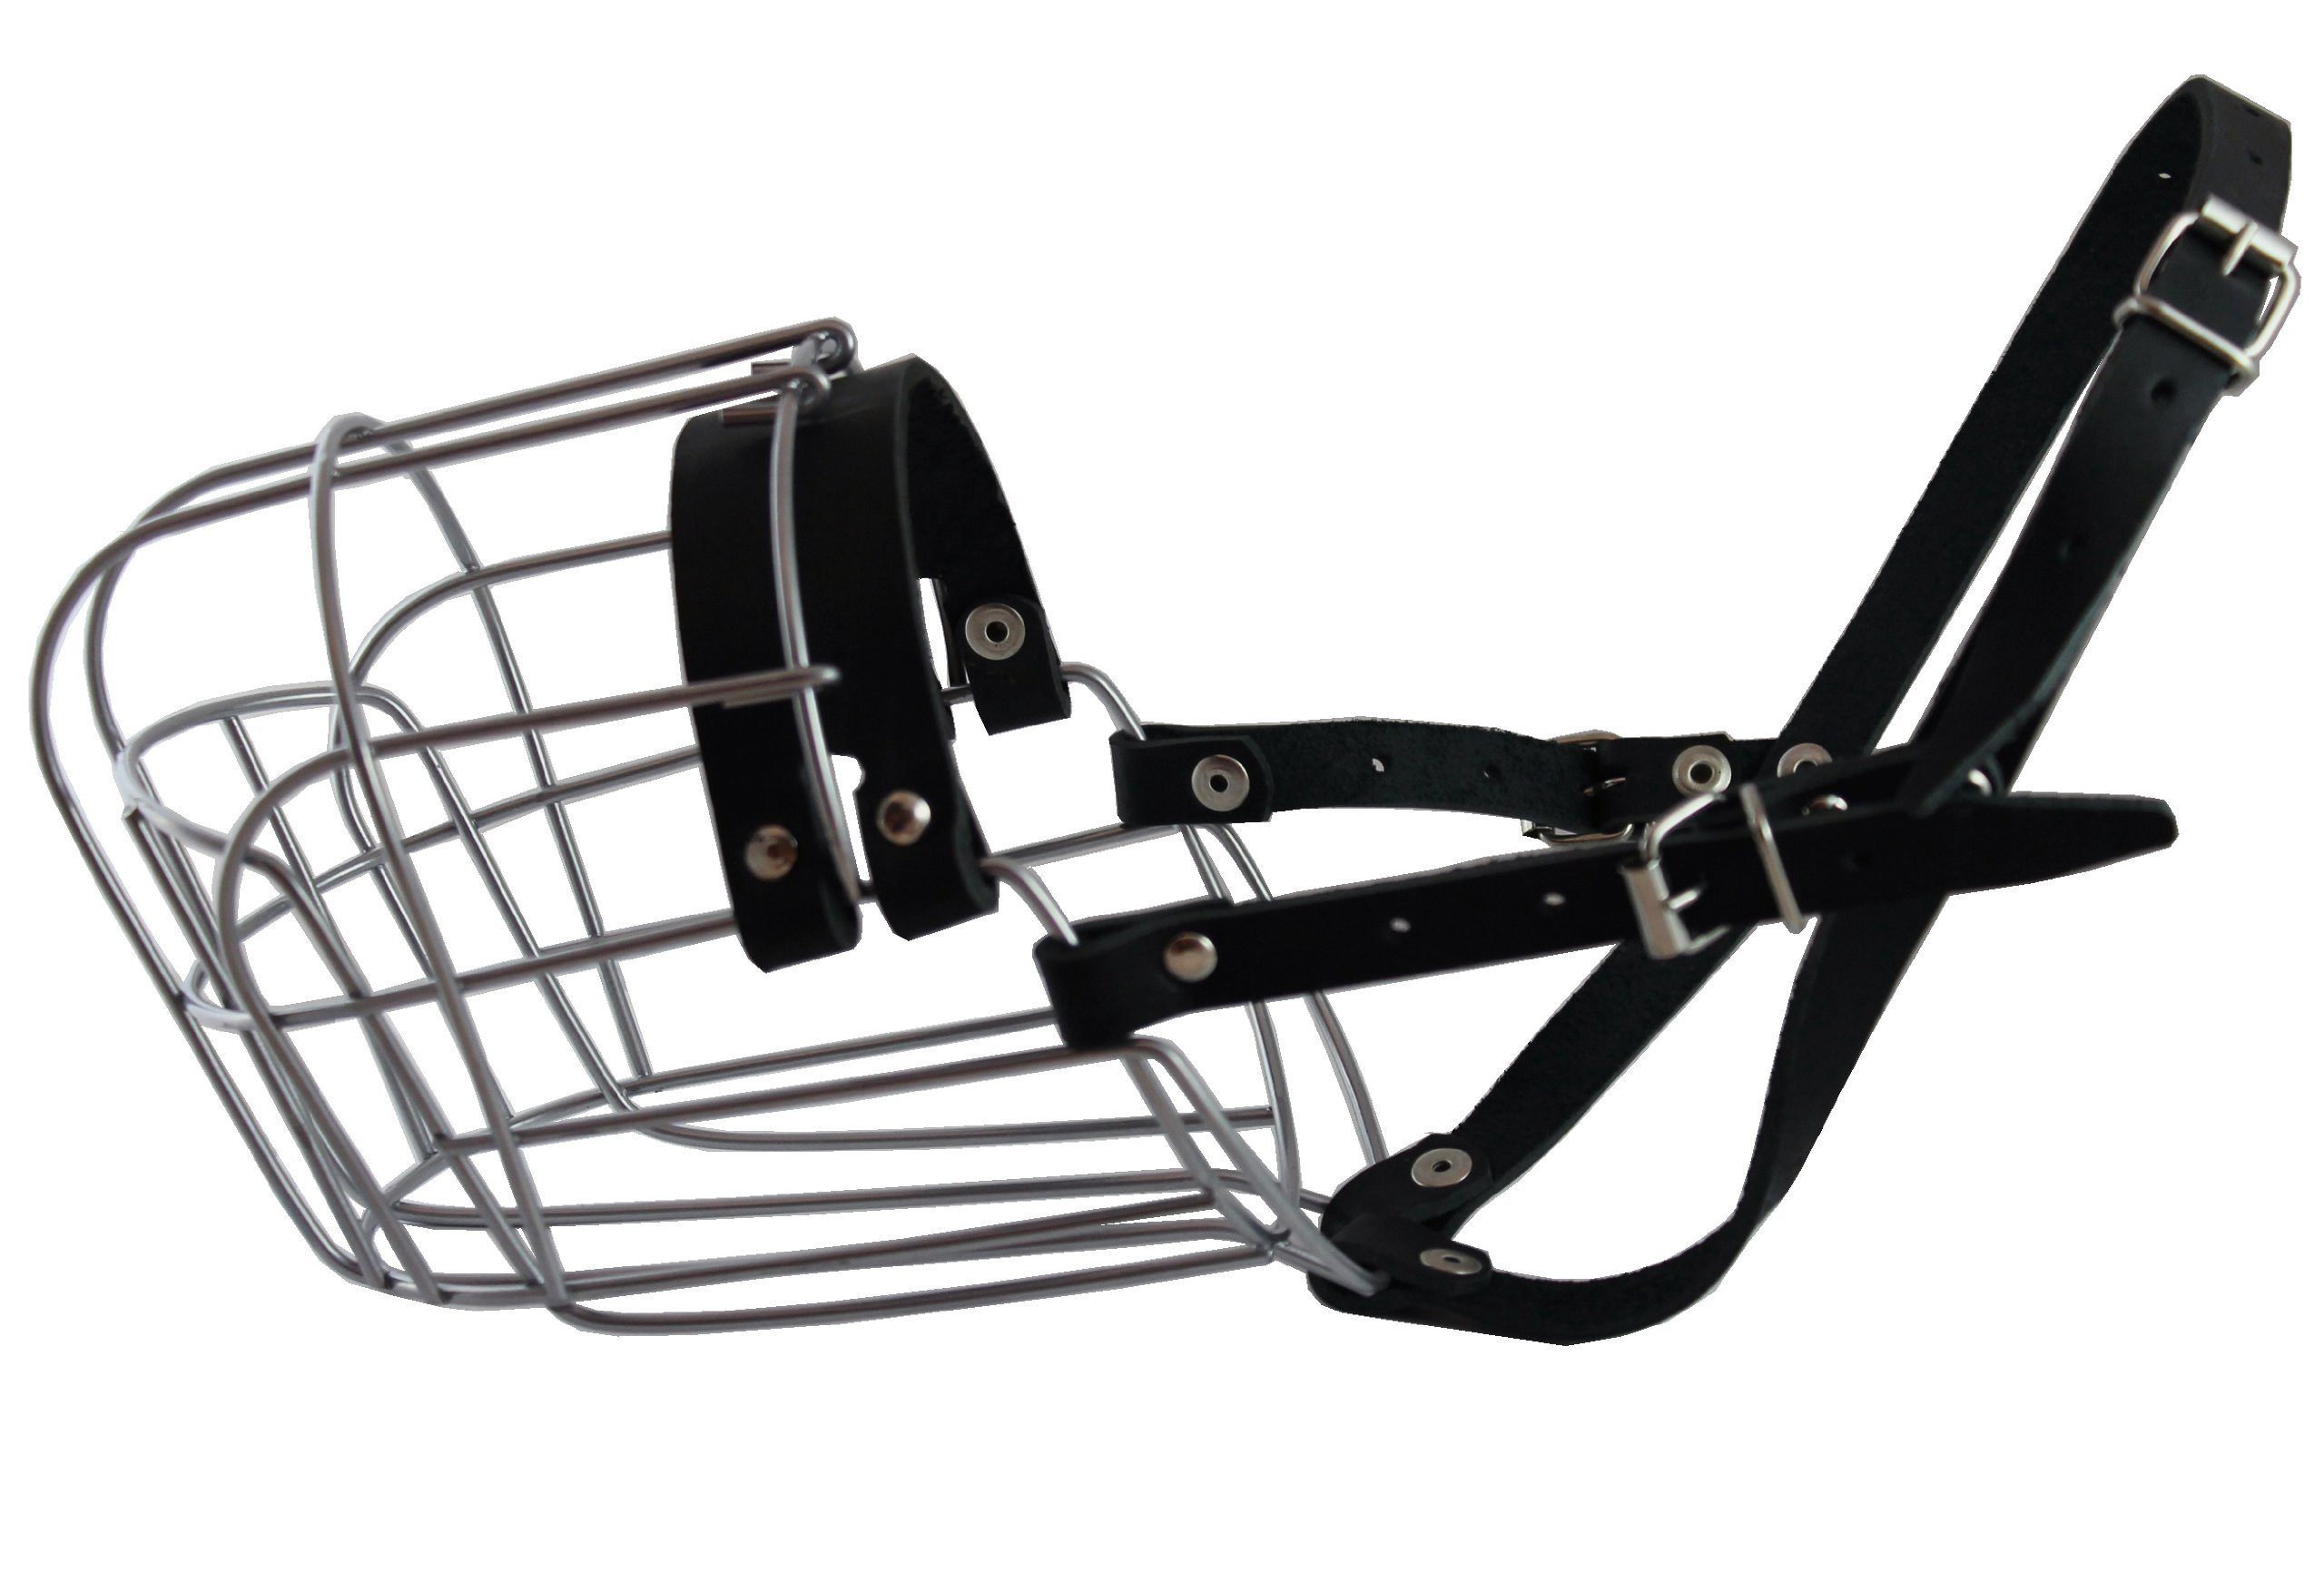 Dogs My Love Metal Wire Basket Dog Muzzle Saint Bernard, Mastiff, Great Dane. Circumference 17'', Length 5.5'' by Dogs My Love